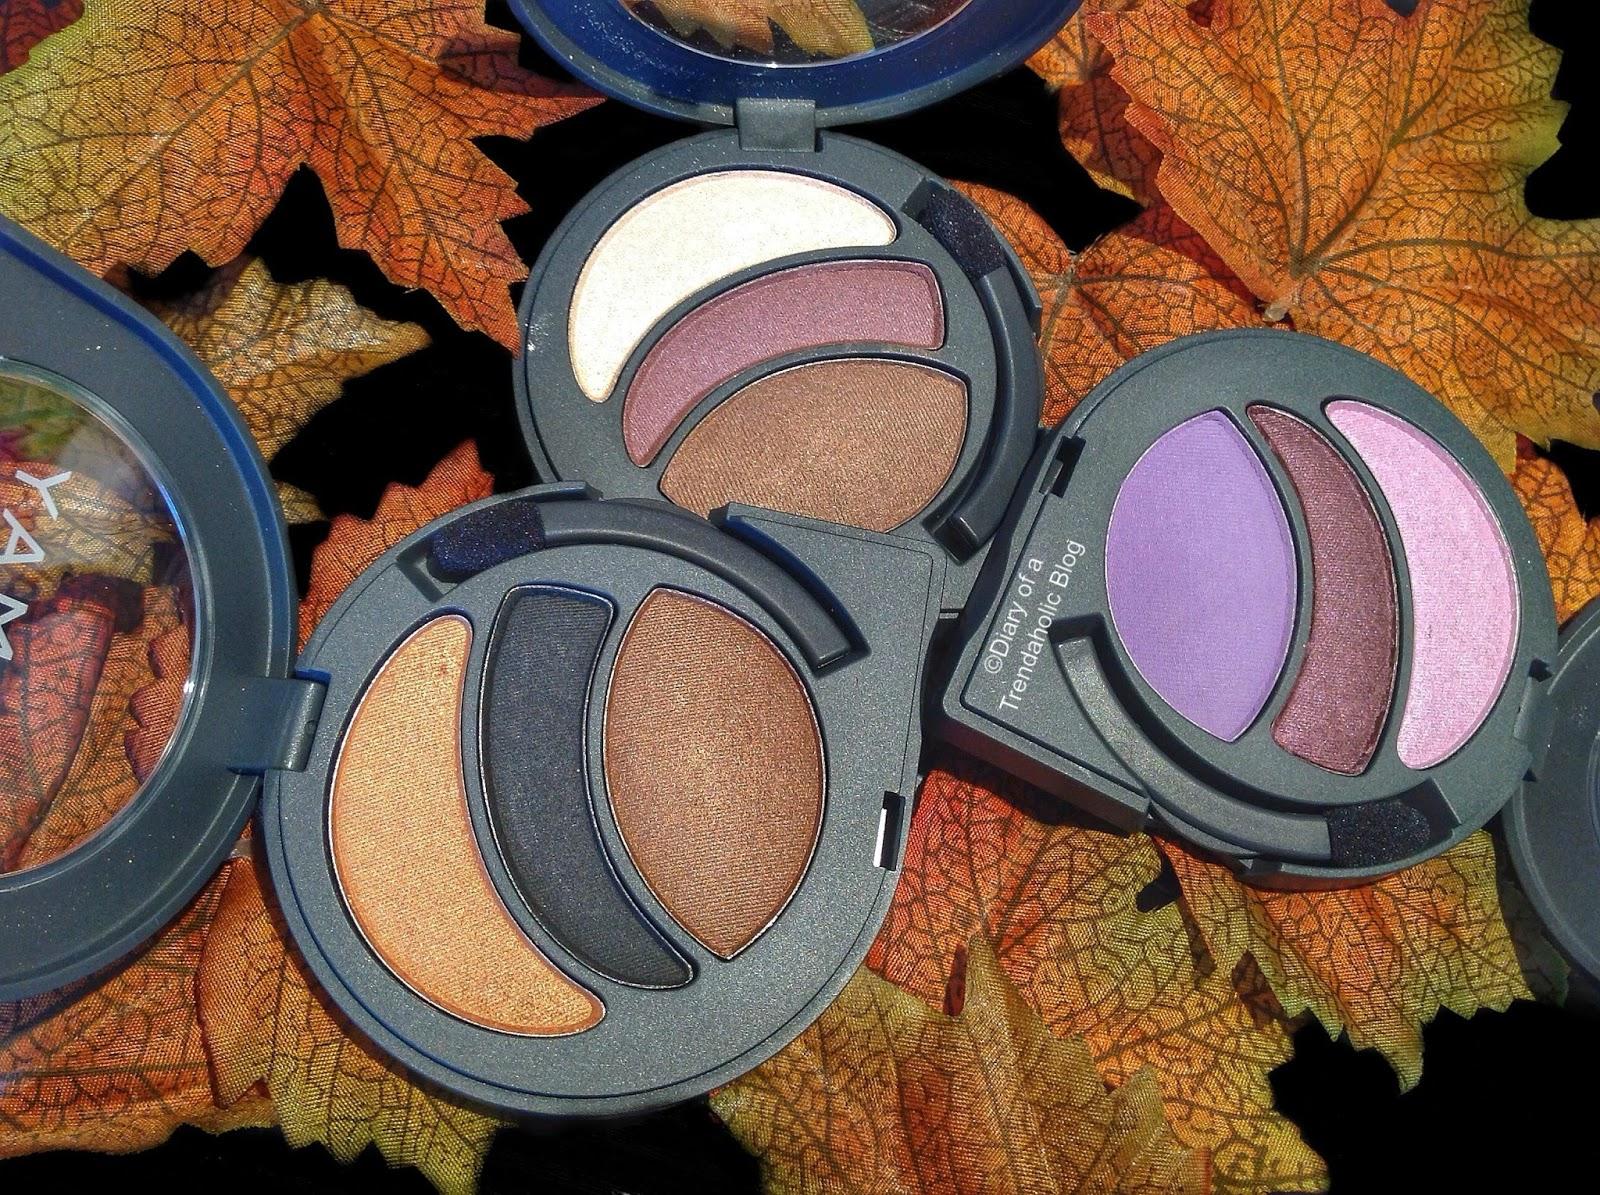 diary of a trendaholic : new almay intense i-color eyeshadow